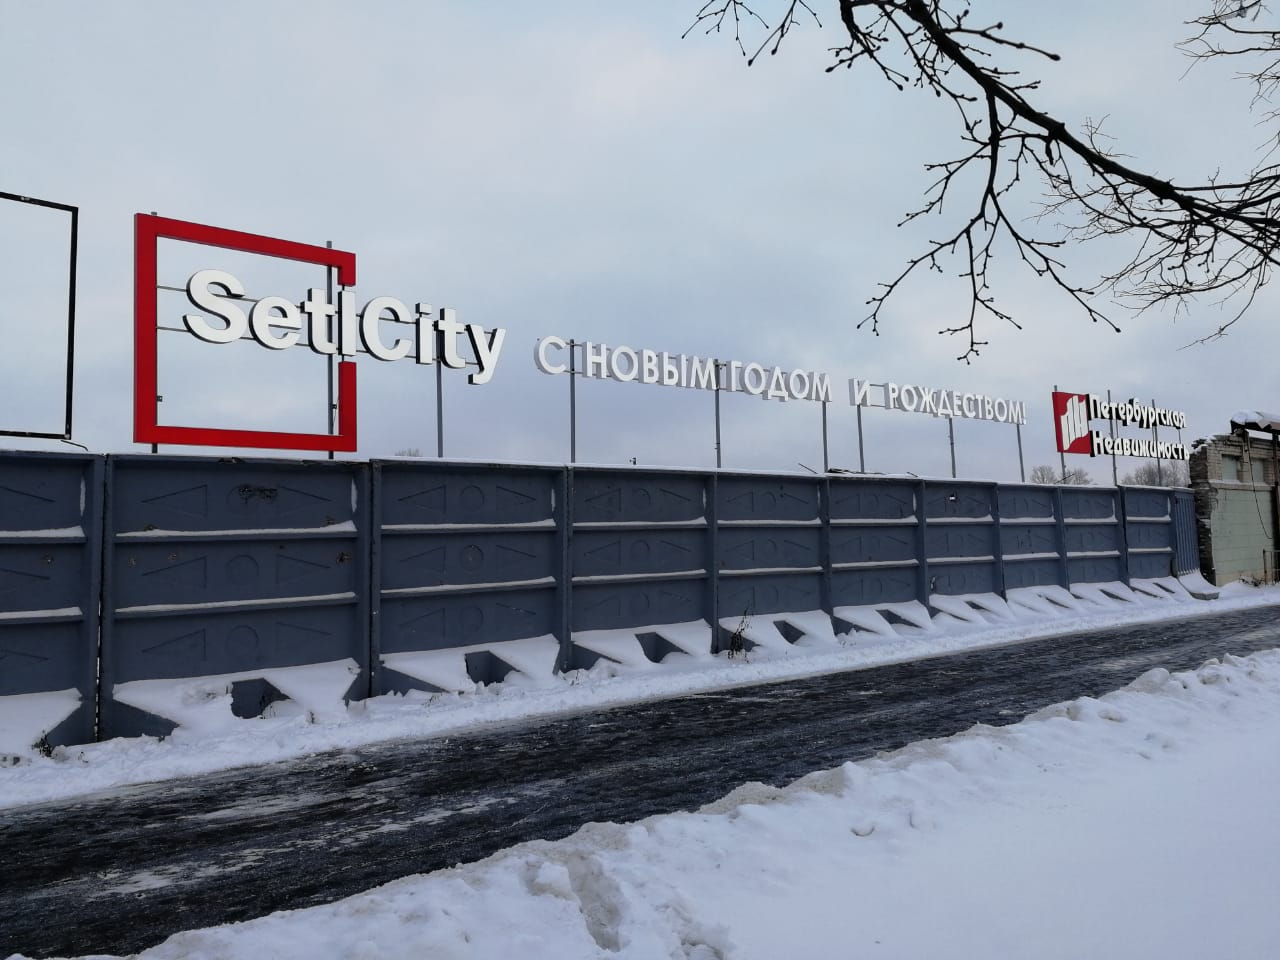 Панно с рекламой Setl City на заказ